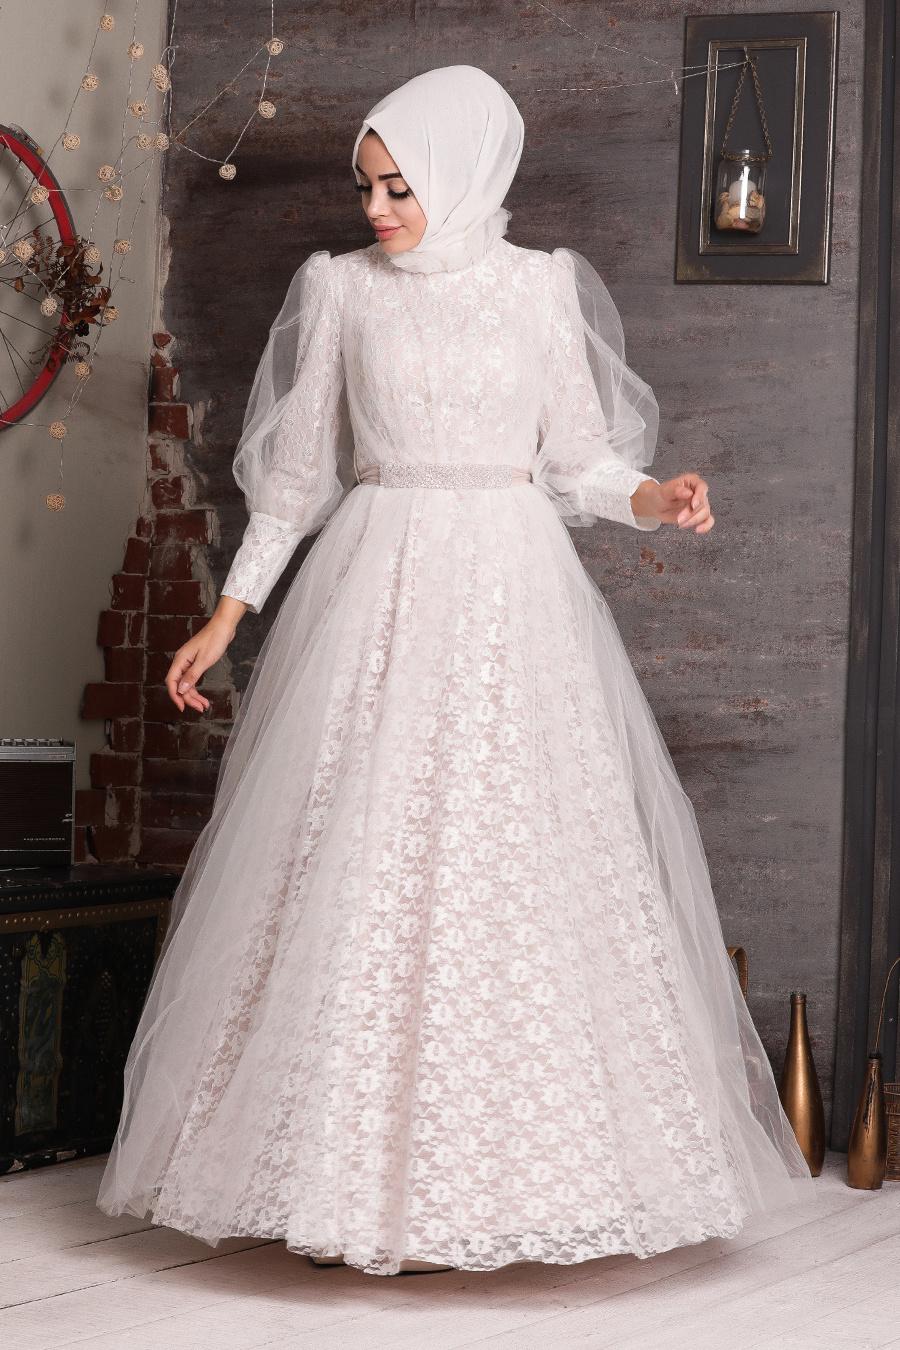 فستان سهرة محتشم أبيض مفصل بدانتيل نسائي